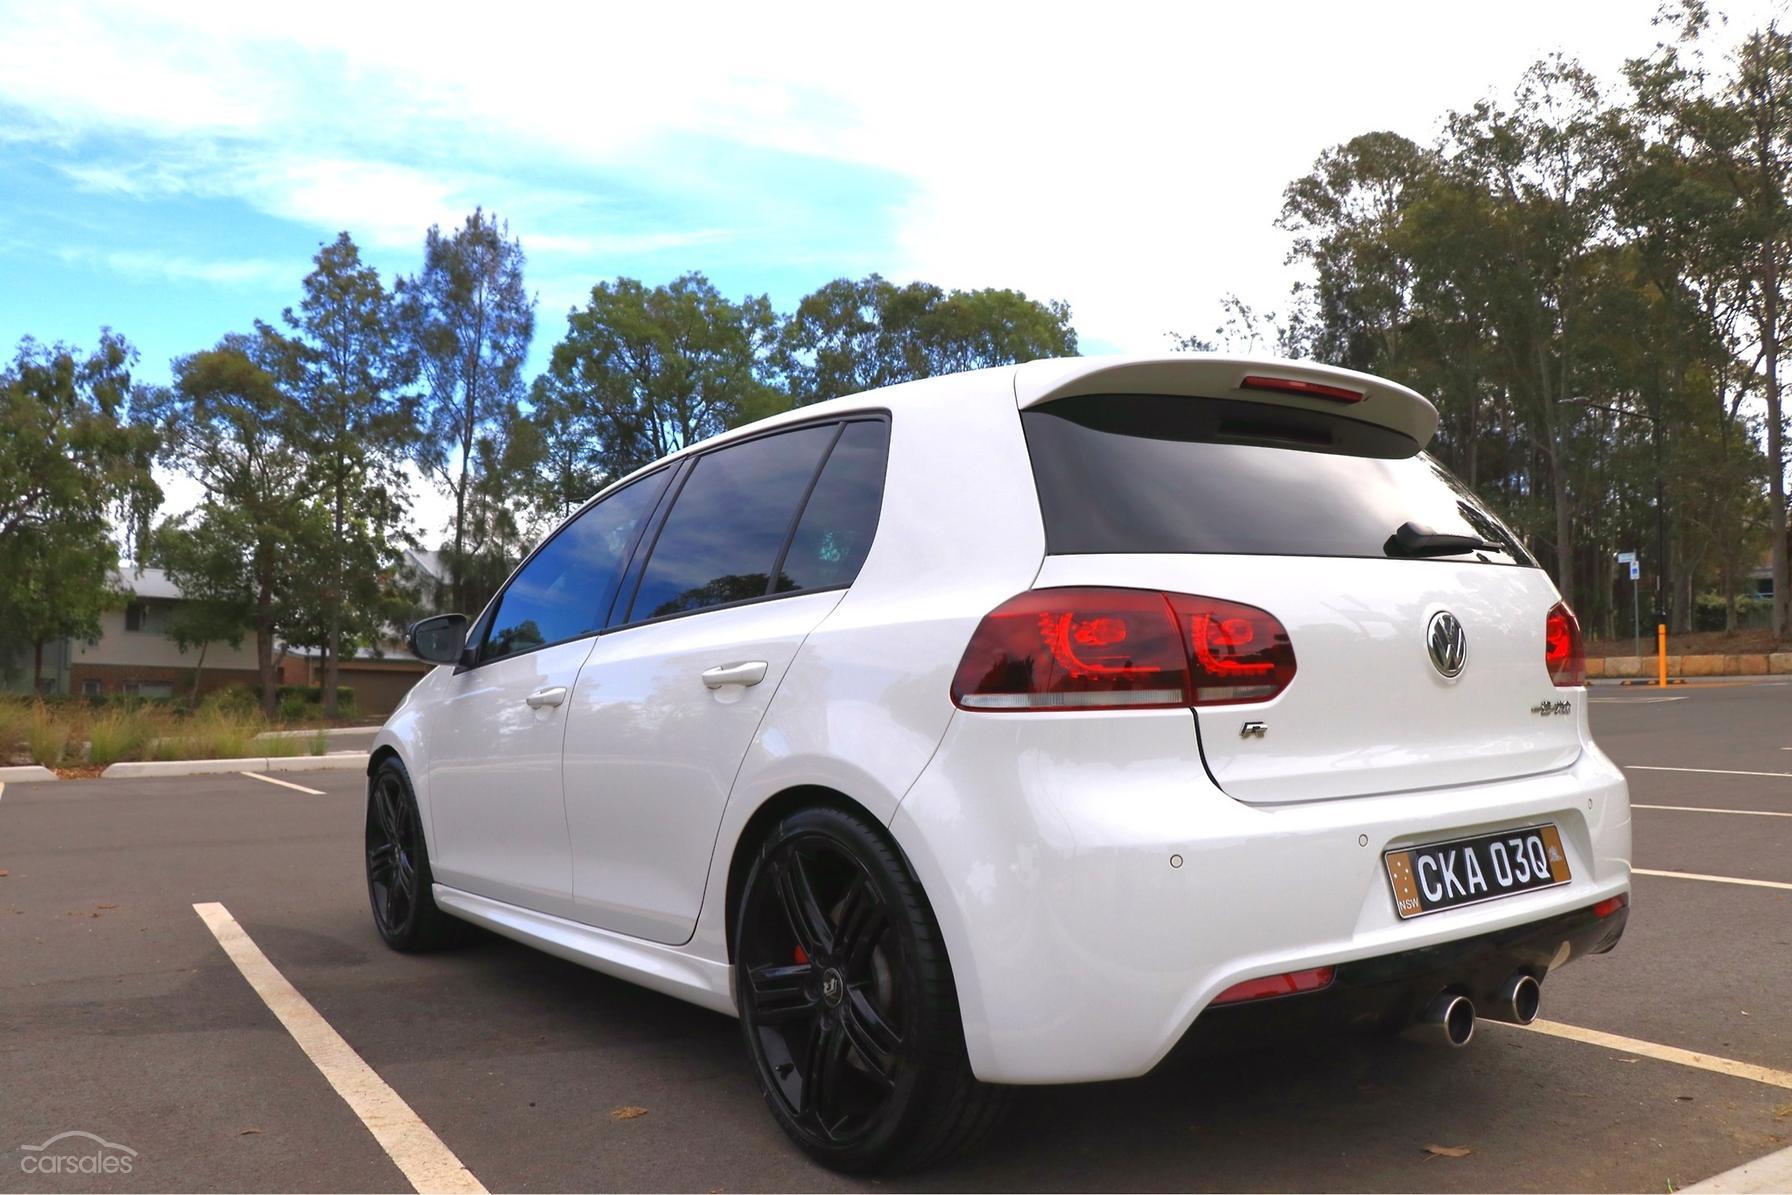 2012 Volkswagen Golf R Vi Manual 4motion My13 Sse Ad 4985925 02 Mustang Fuel Filter Location